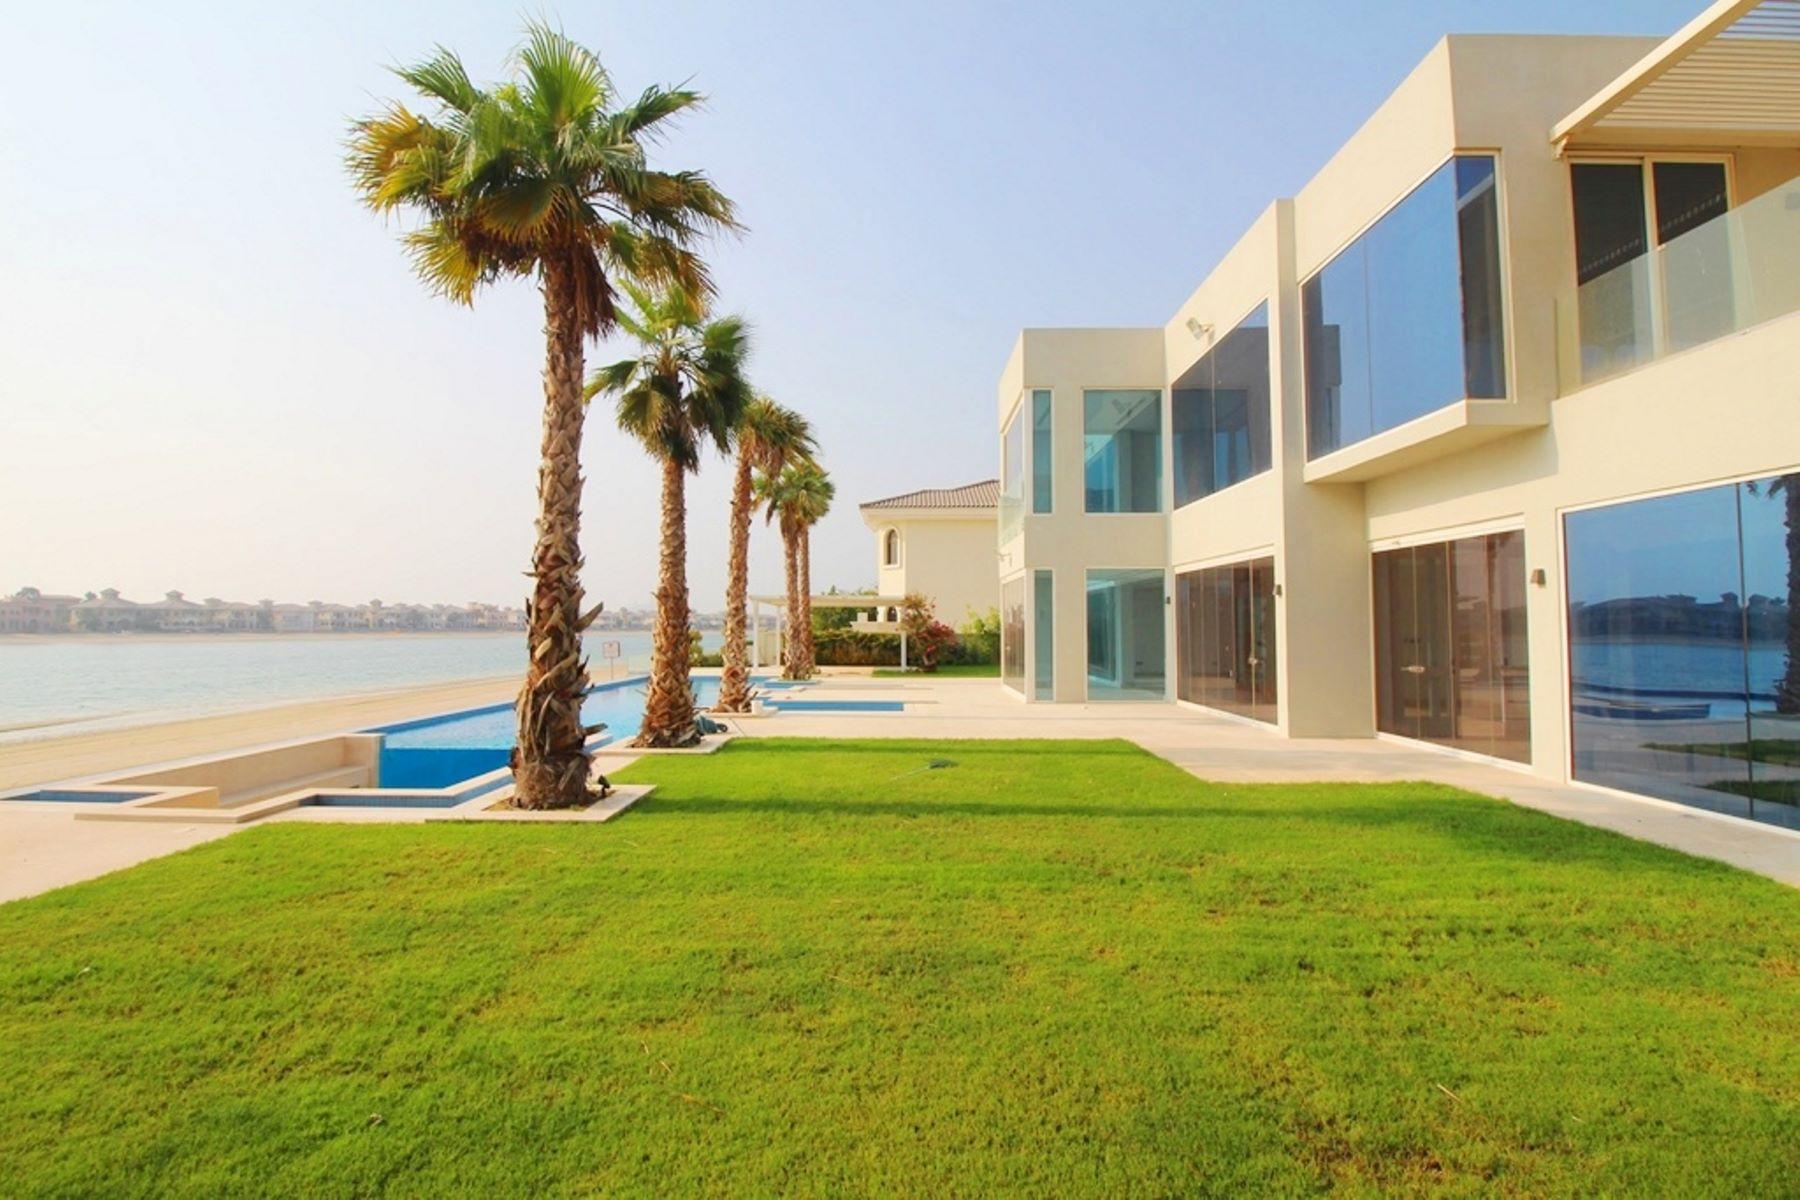 Property for Sale at Renovated Great Rotunda Style Dubai, Dubai United Arab Emirates